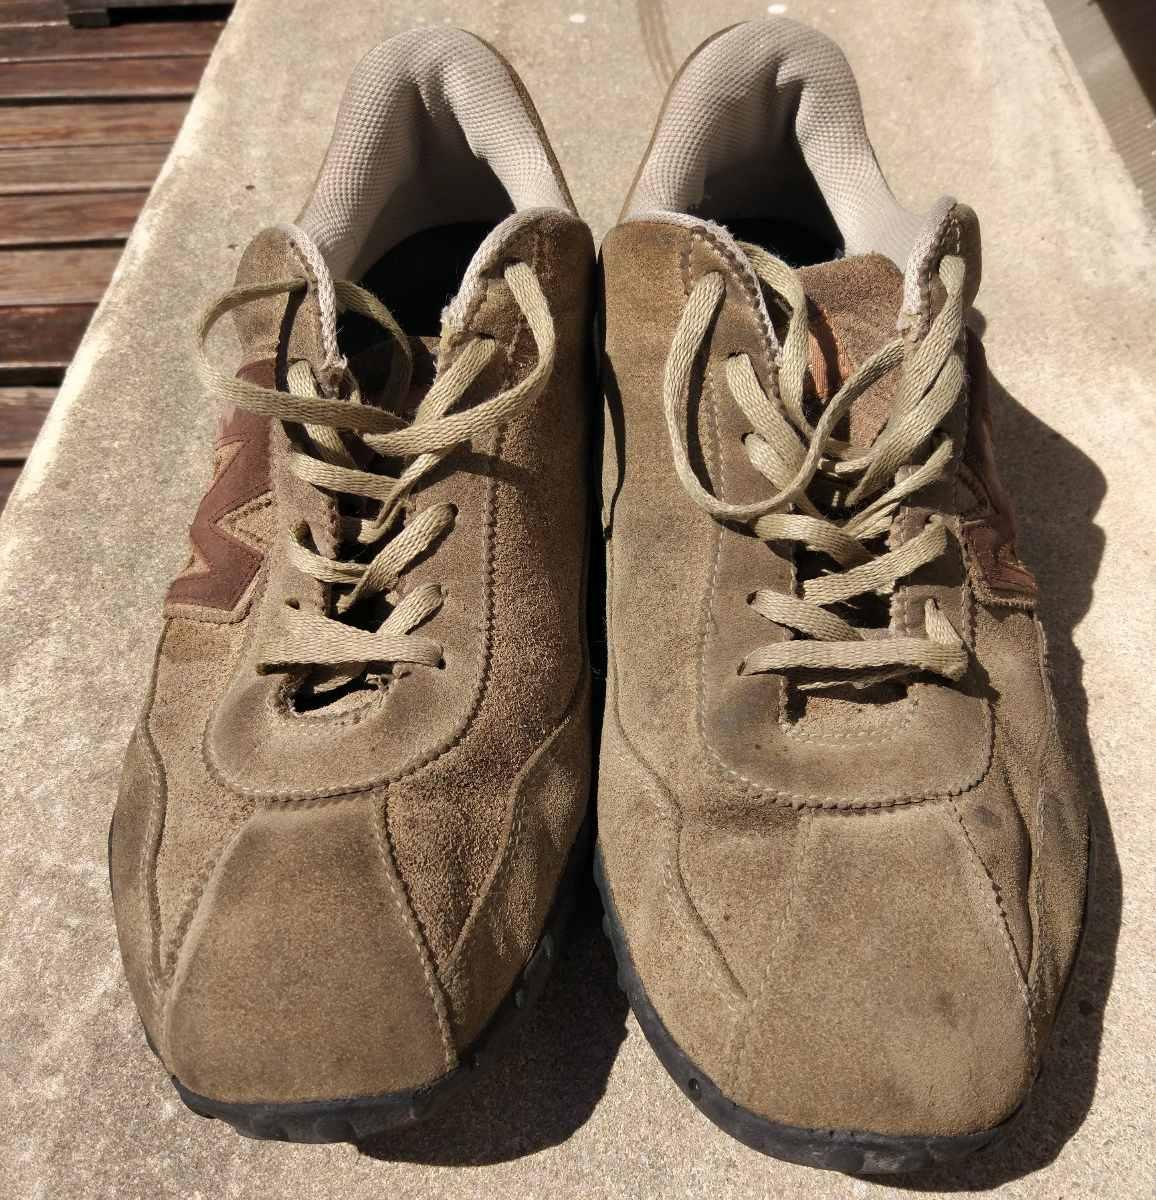 4faff3213f2c5 Zapatillas Merrell Hombre Zapato Trekking Original Deportes ...